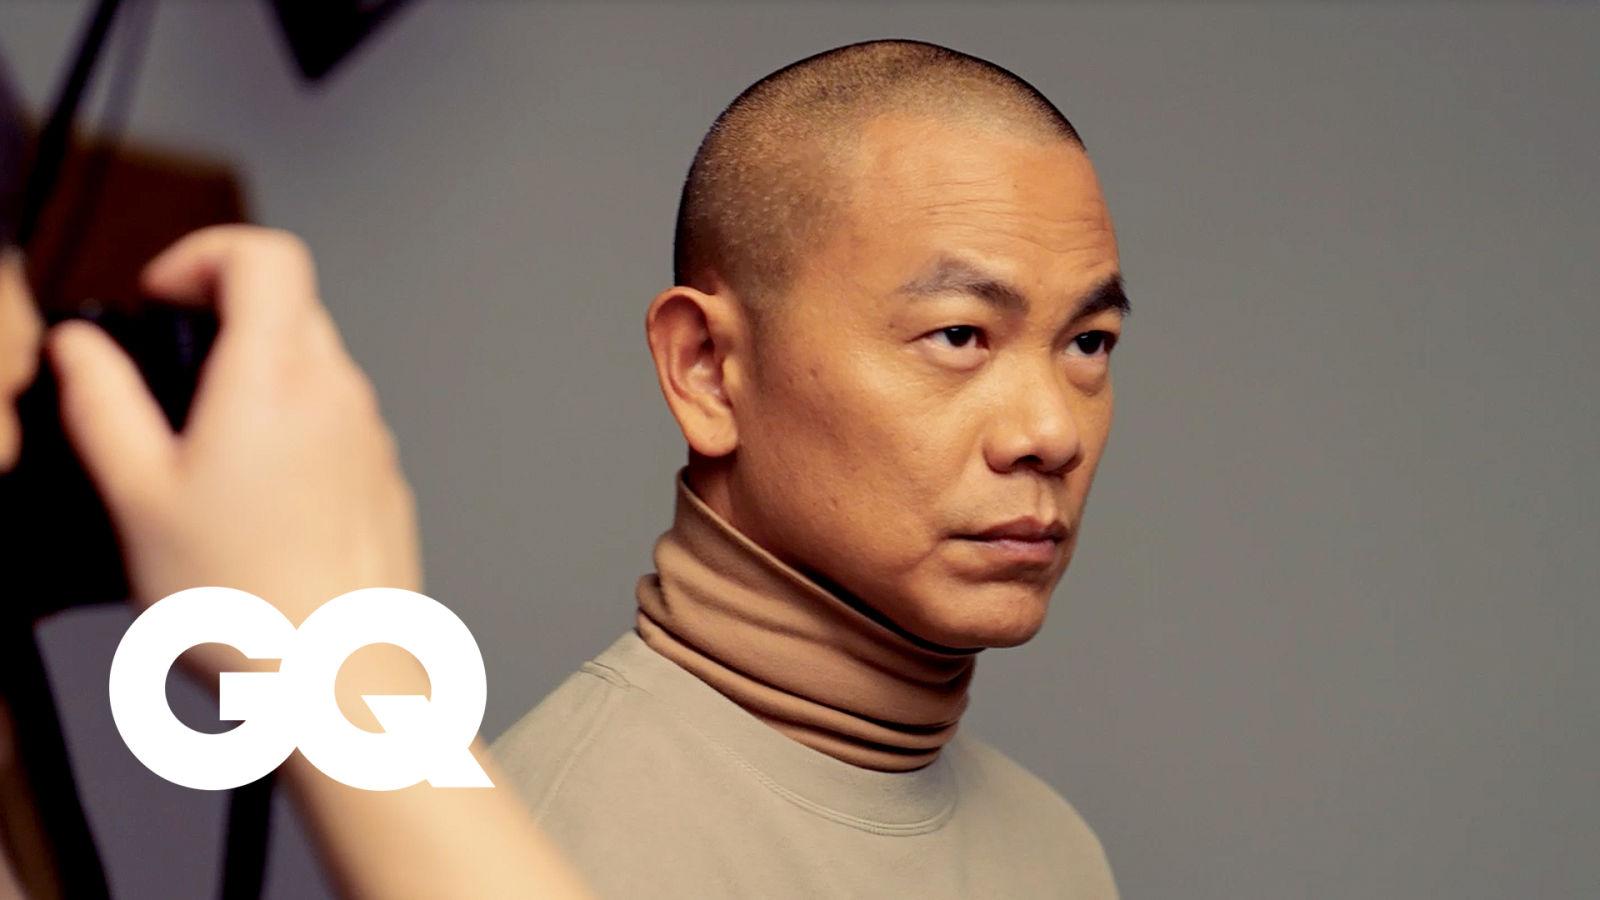 江振誠 創造品味的人 GQ Tastemaker|GQ Cover